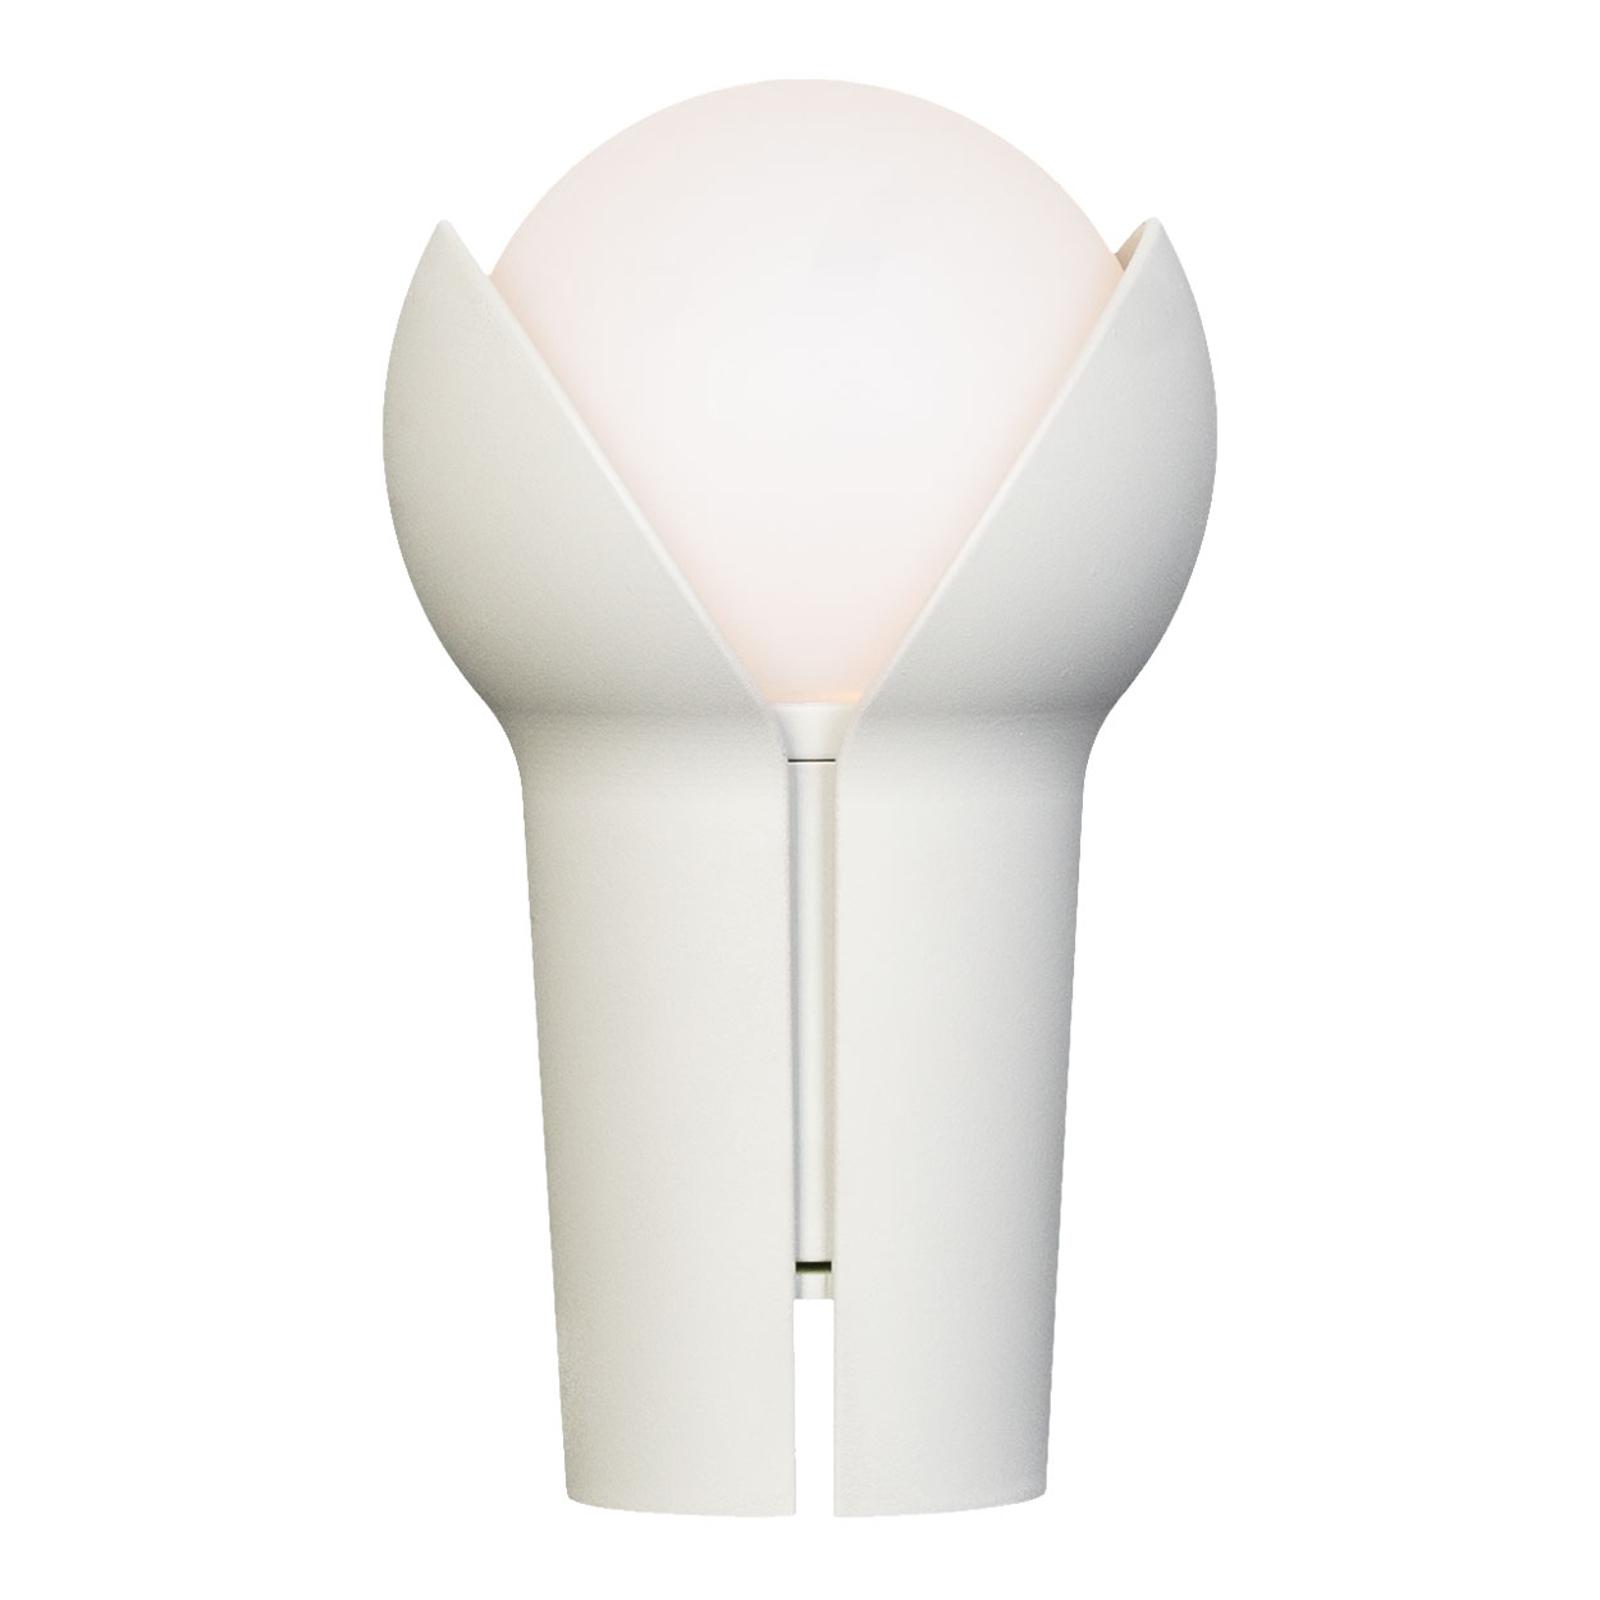 Innermost Bud lampe à poser LED, portable, Ash